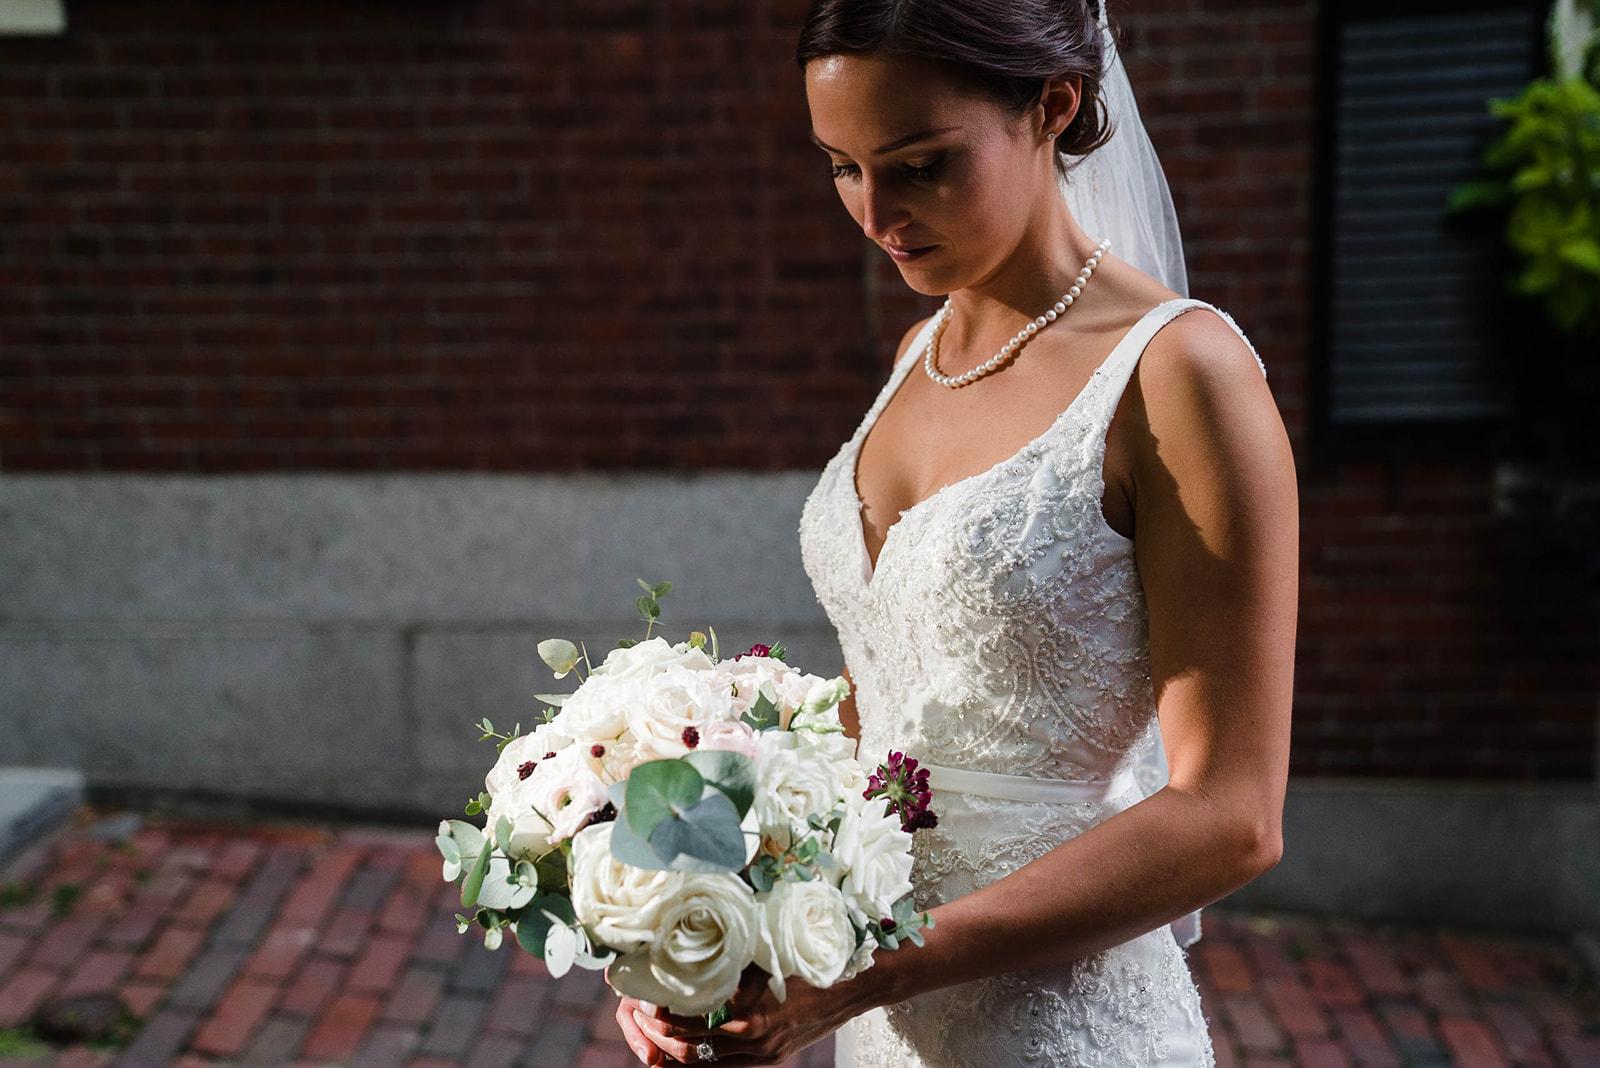 wedding-flowers-state-room-boston-lesfleurs (6).jpg